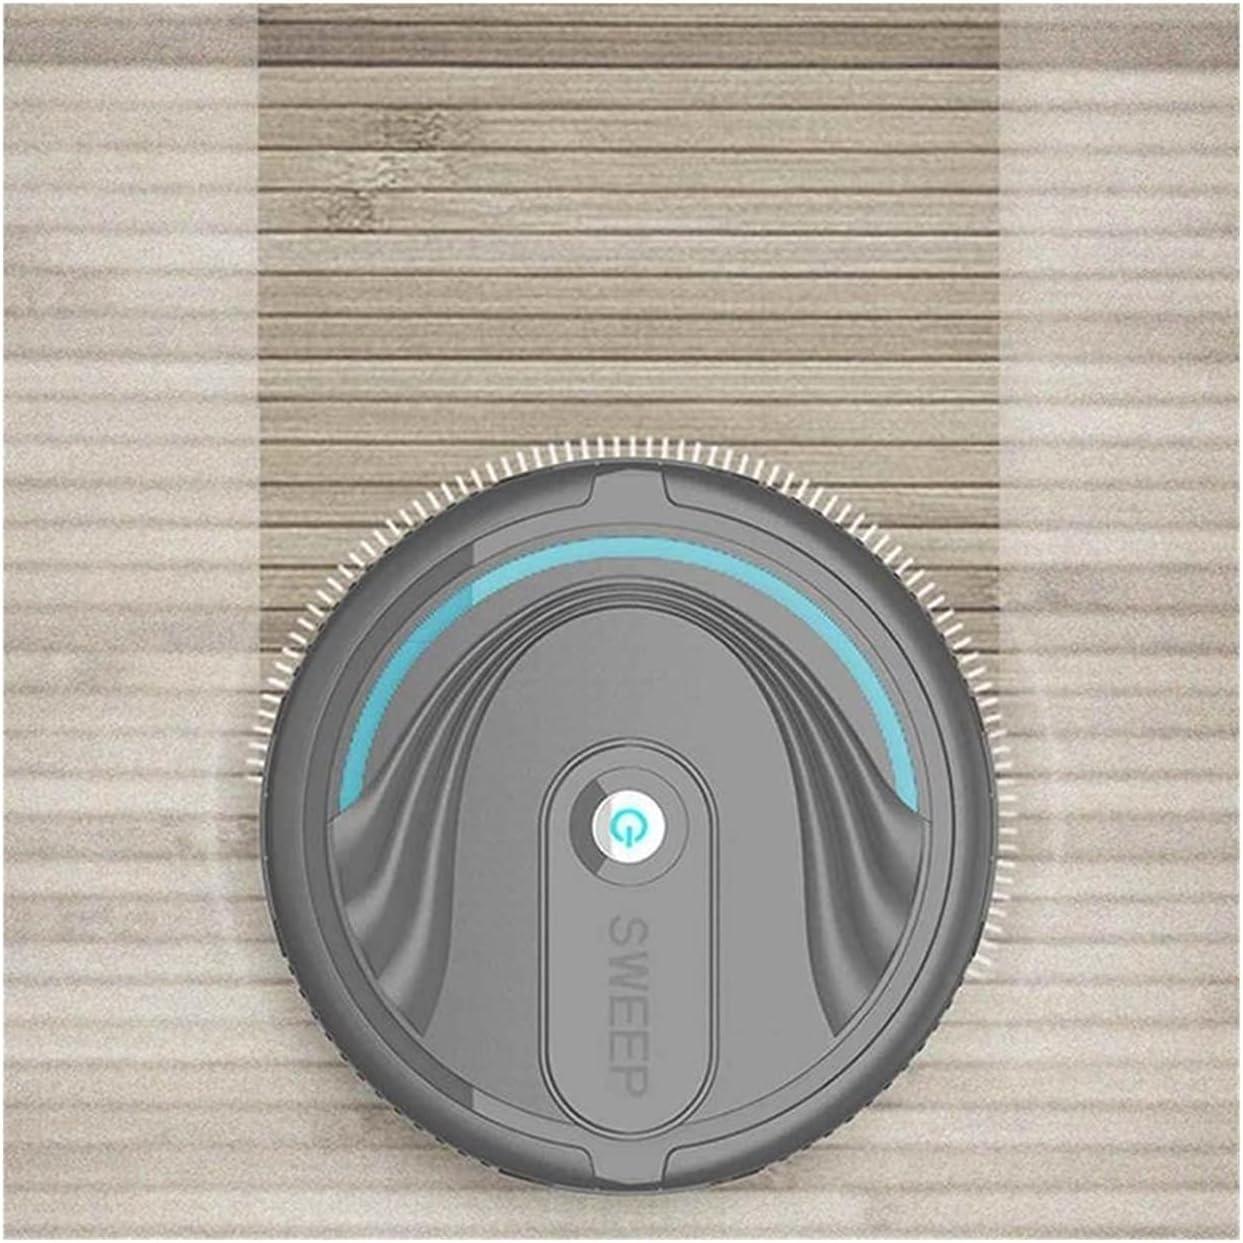 Bargain sale 100% quality warranty Carpet Sweeper Rechargeable Smart Cleaning Robotic Vacuum Floor